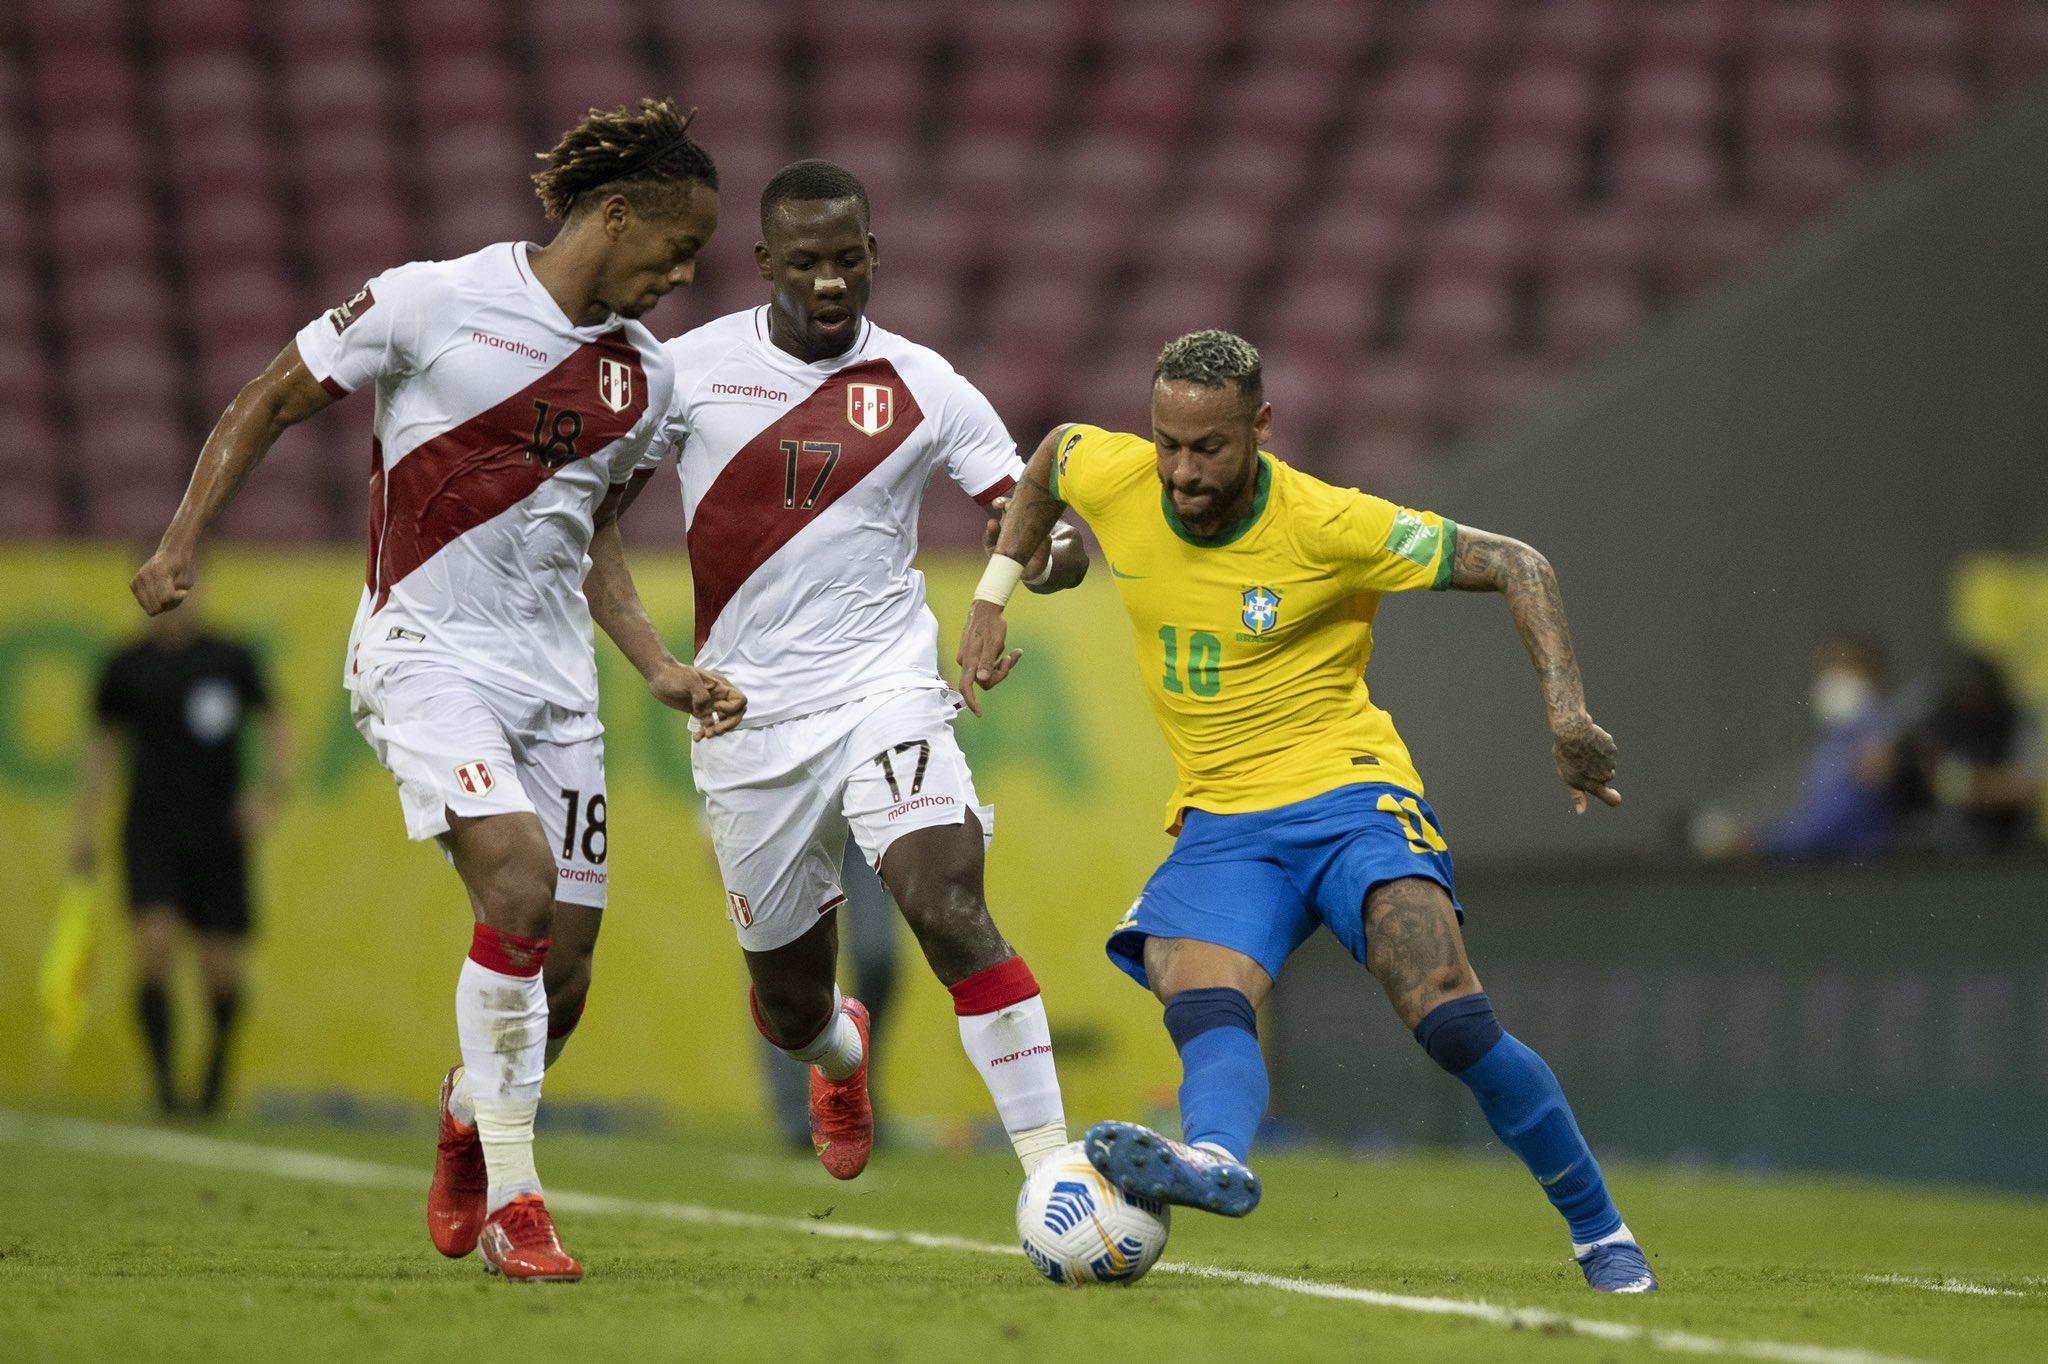 Neymar menggiring bola melewati dua pemain di Pernambuco, Recife pada pagi hari tanggal 10 September.  Foto: CBF